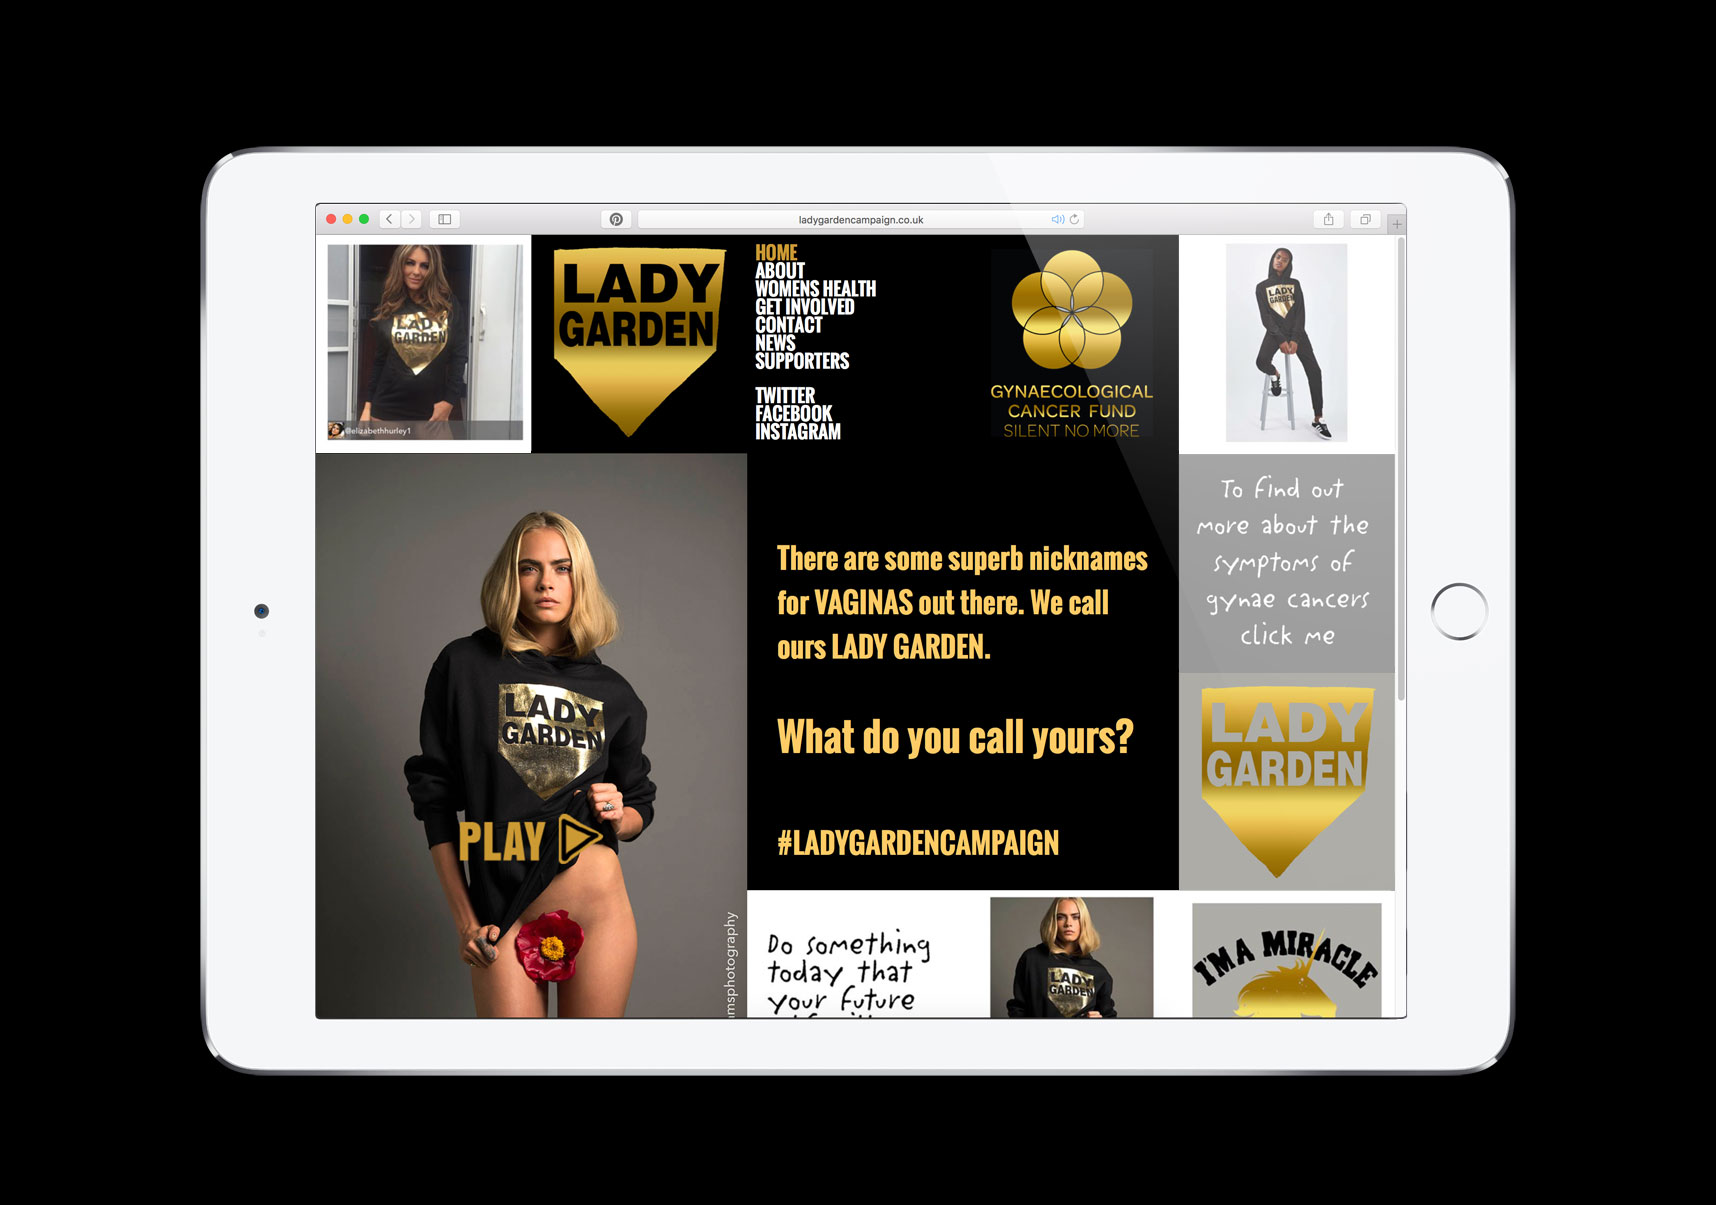 iPad_LadyGarden2016_01.jpg